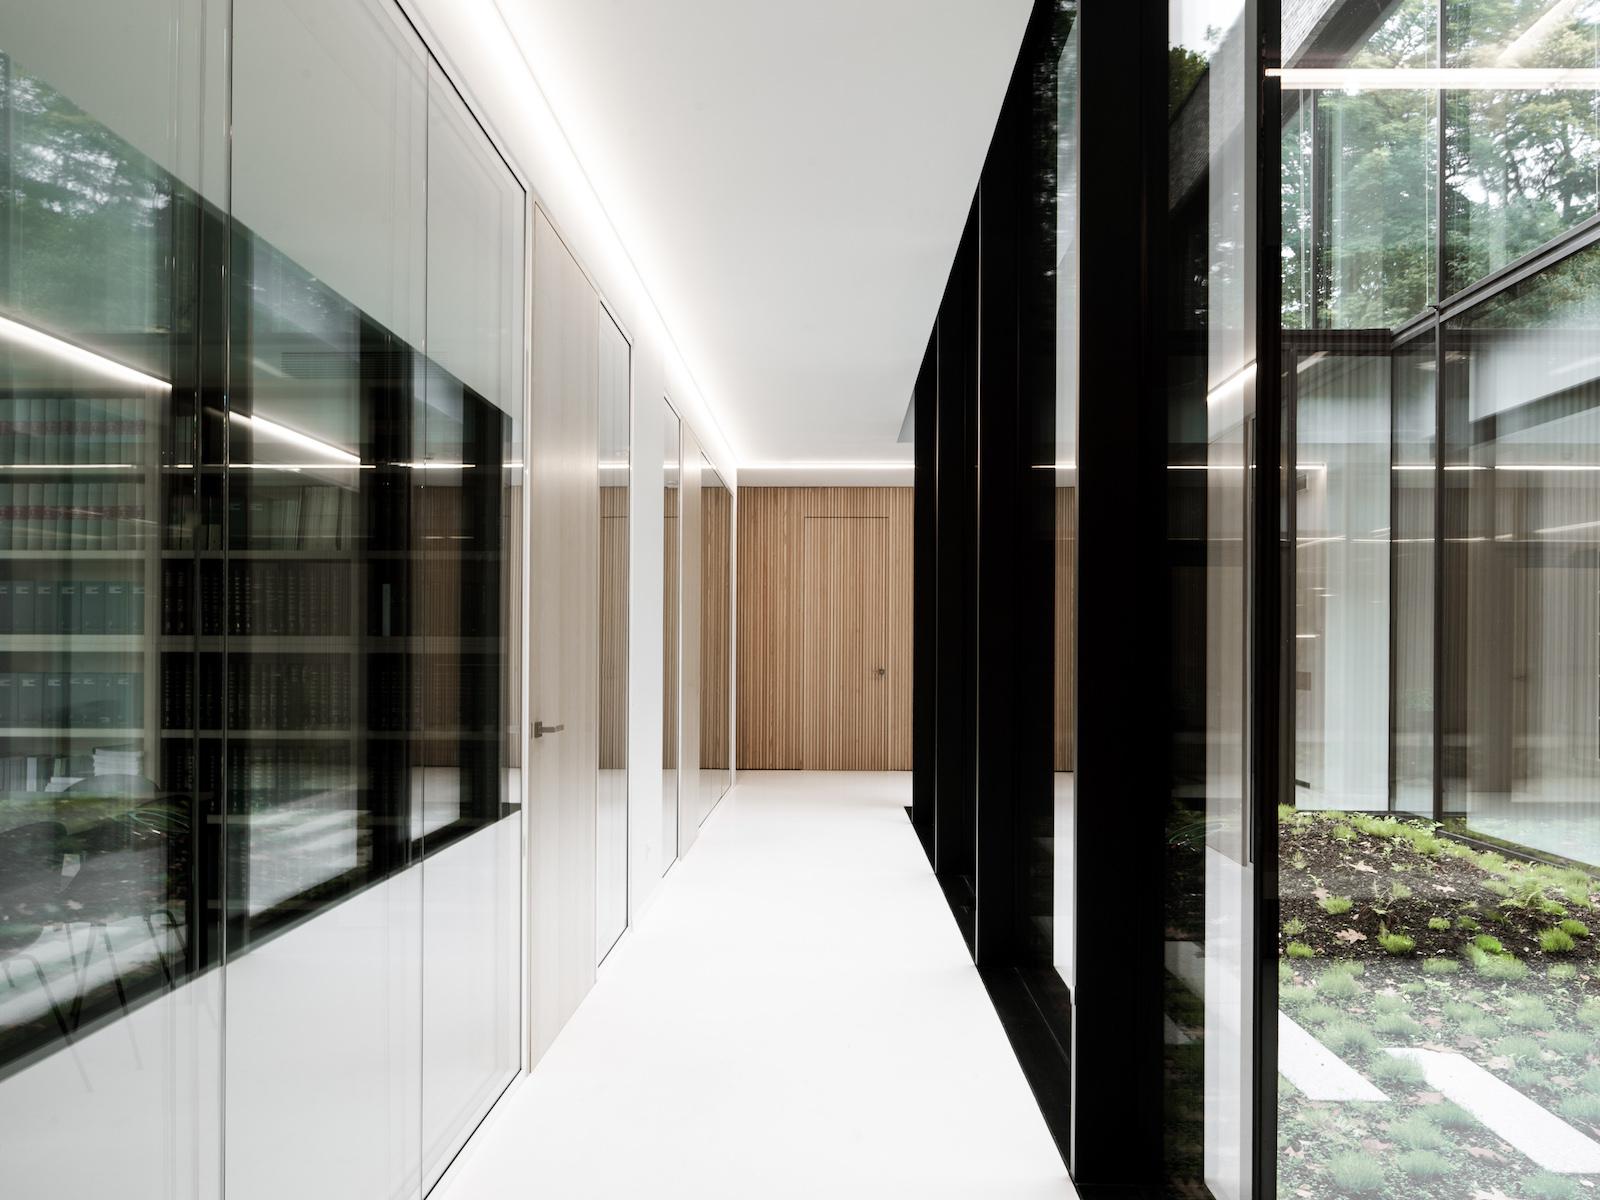 abscis architecten notariaat interieur